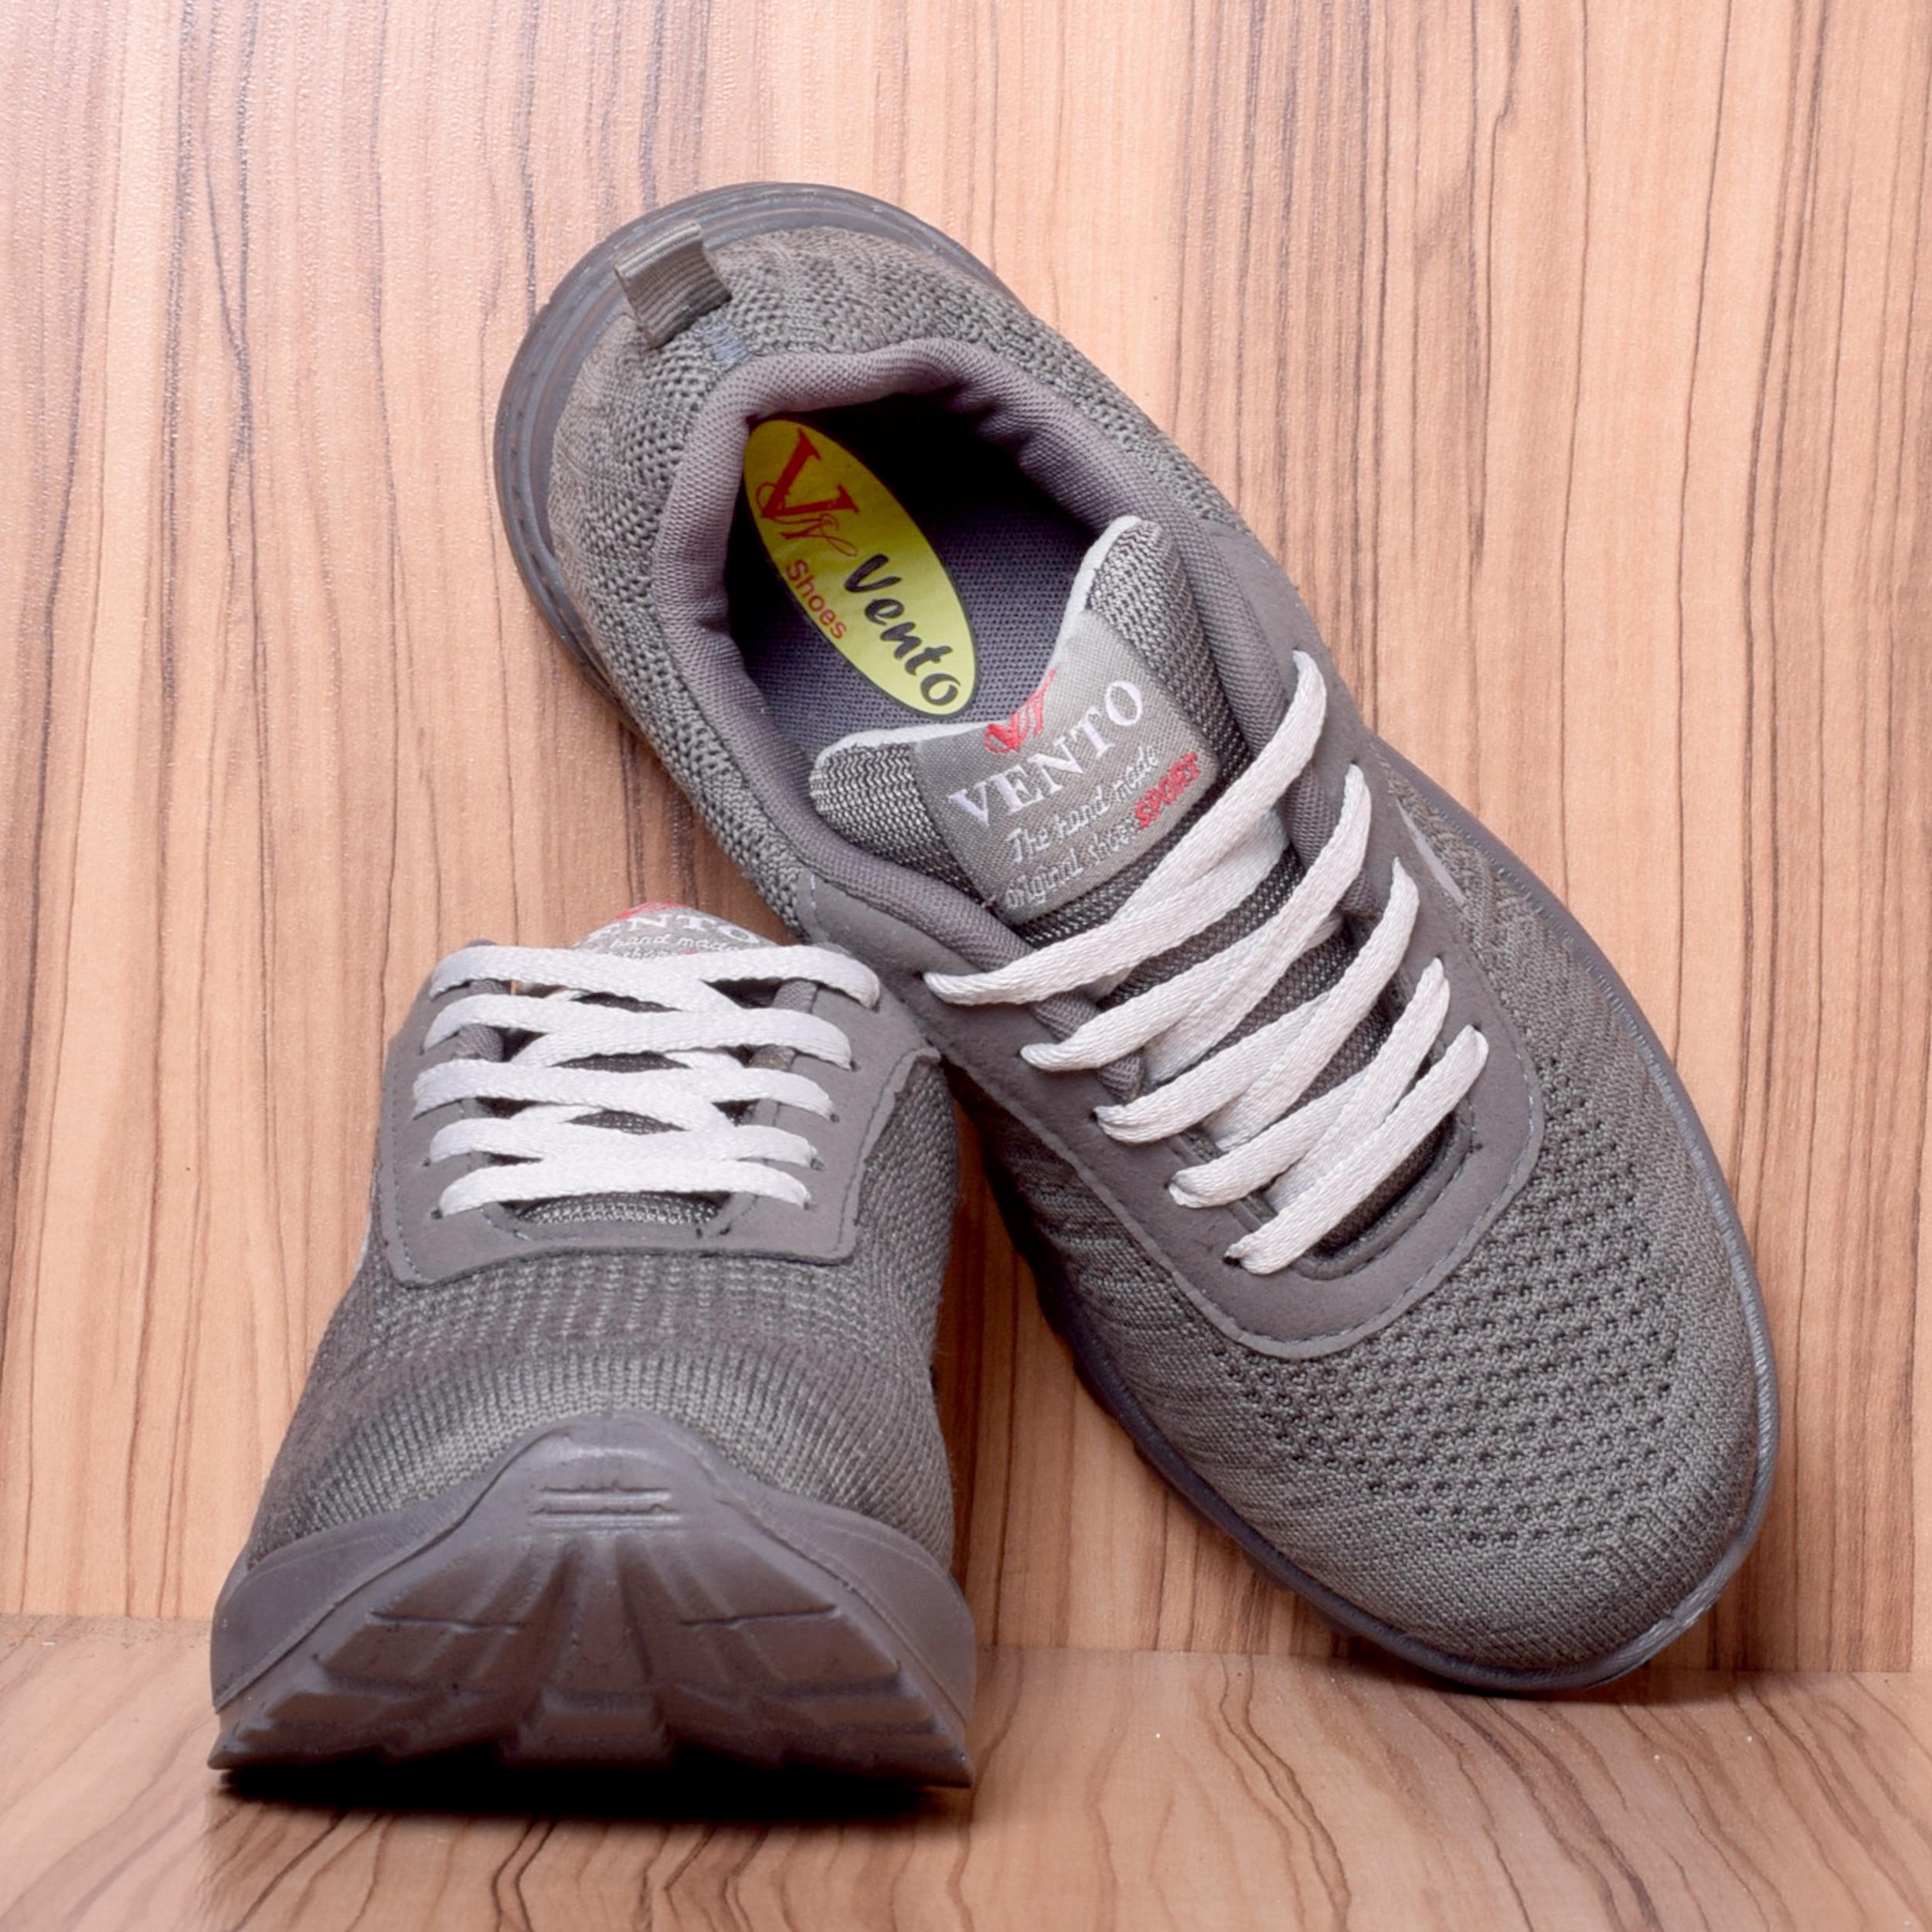 کفش راحتی زنانه ونتو کد GRY-2124